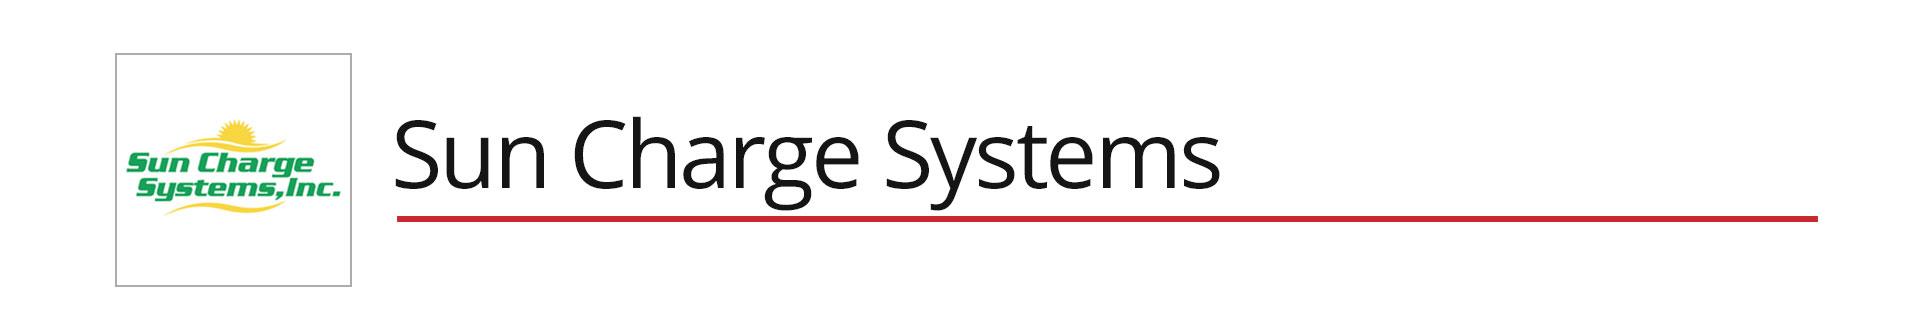 SunChargeSystems_CADBlocksHeader_2019.jpg